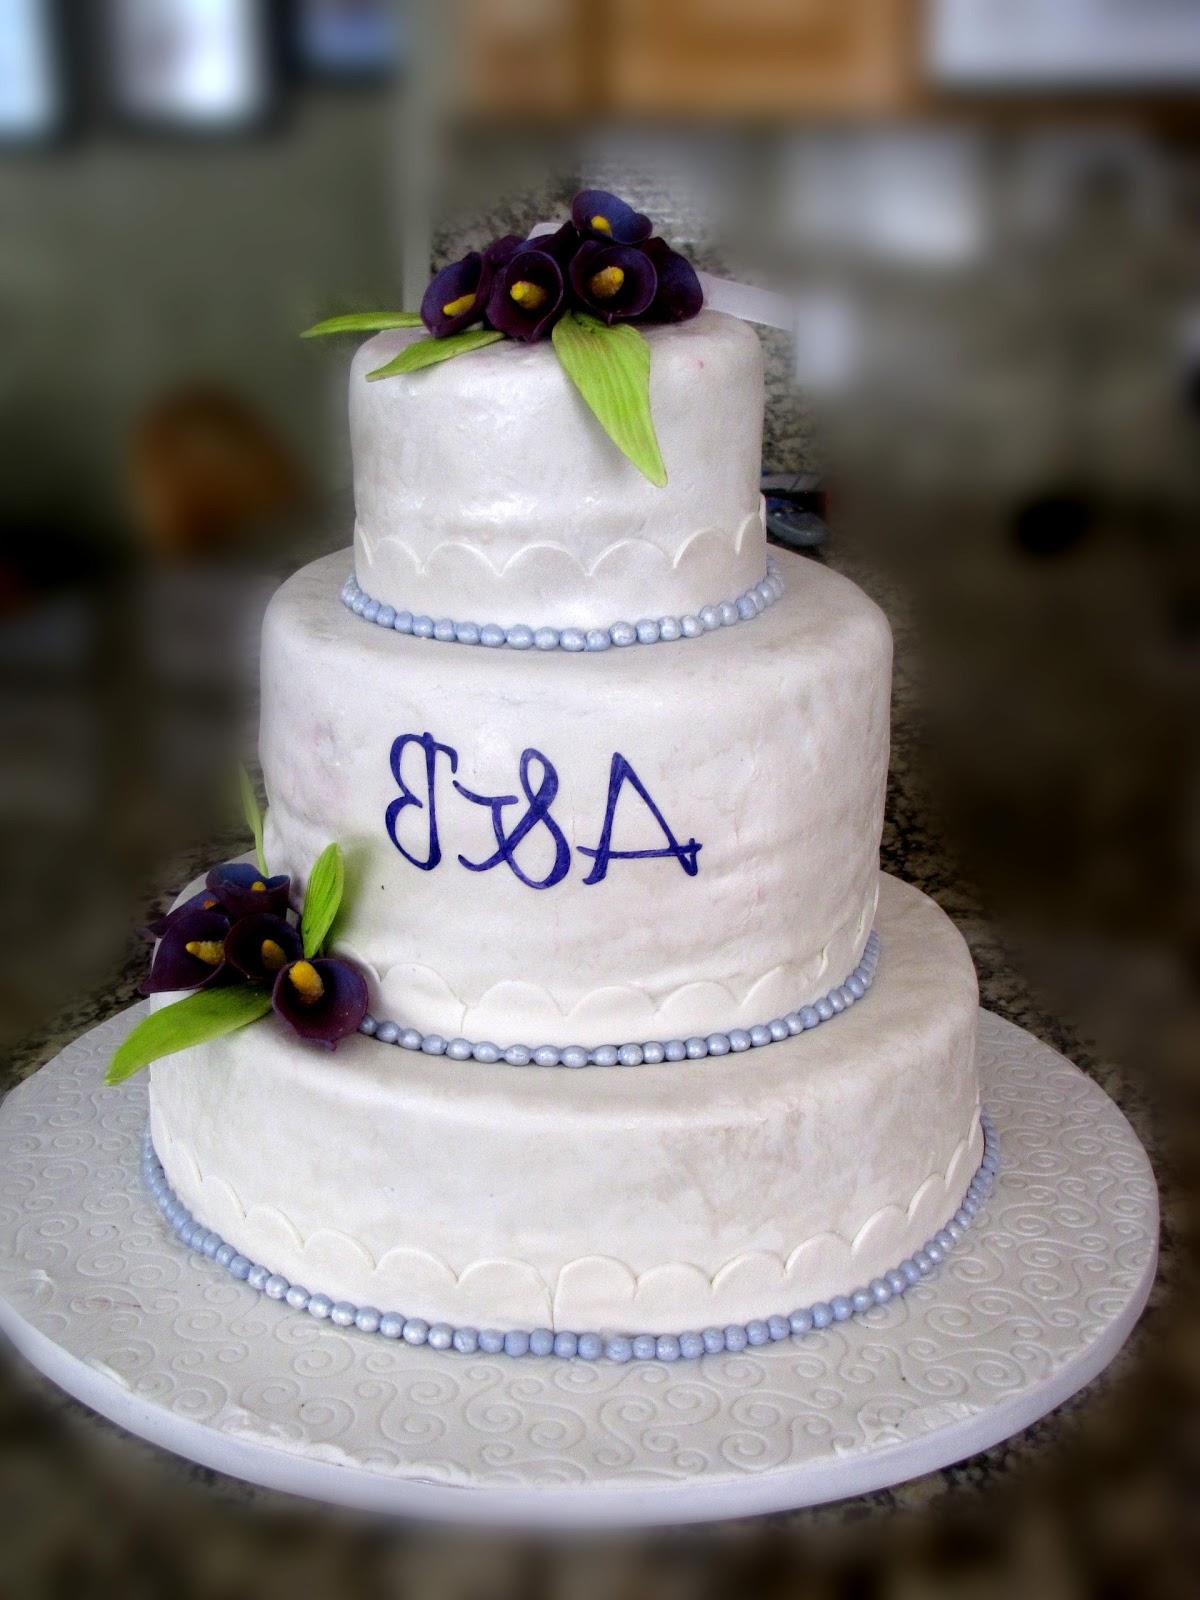 This mini wedding cake is